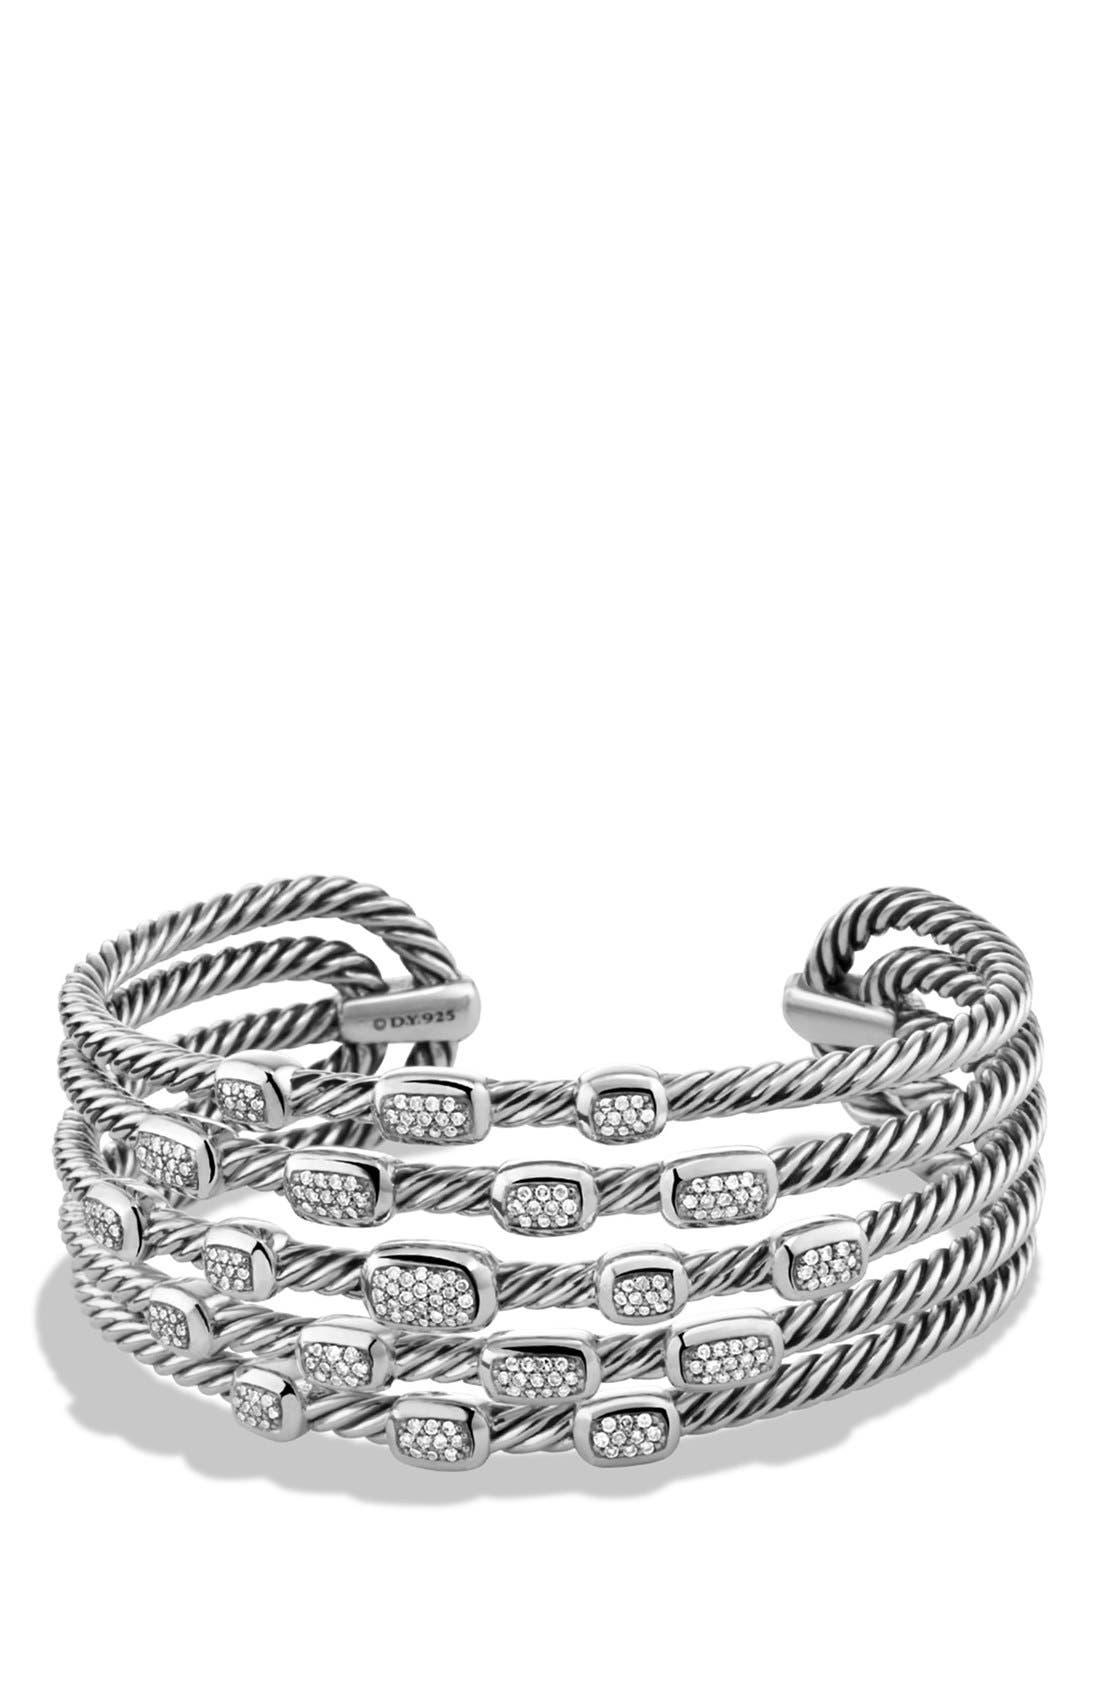 'Confetti' Wide Cuff Bracelet with Diamonds,                         Main,                         color, 040